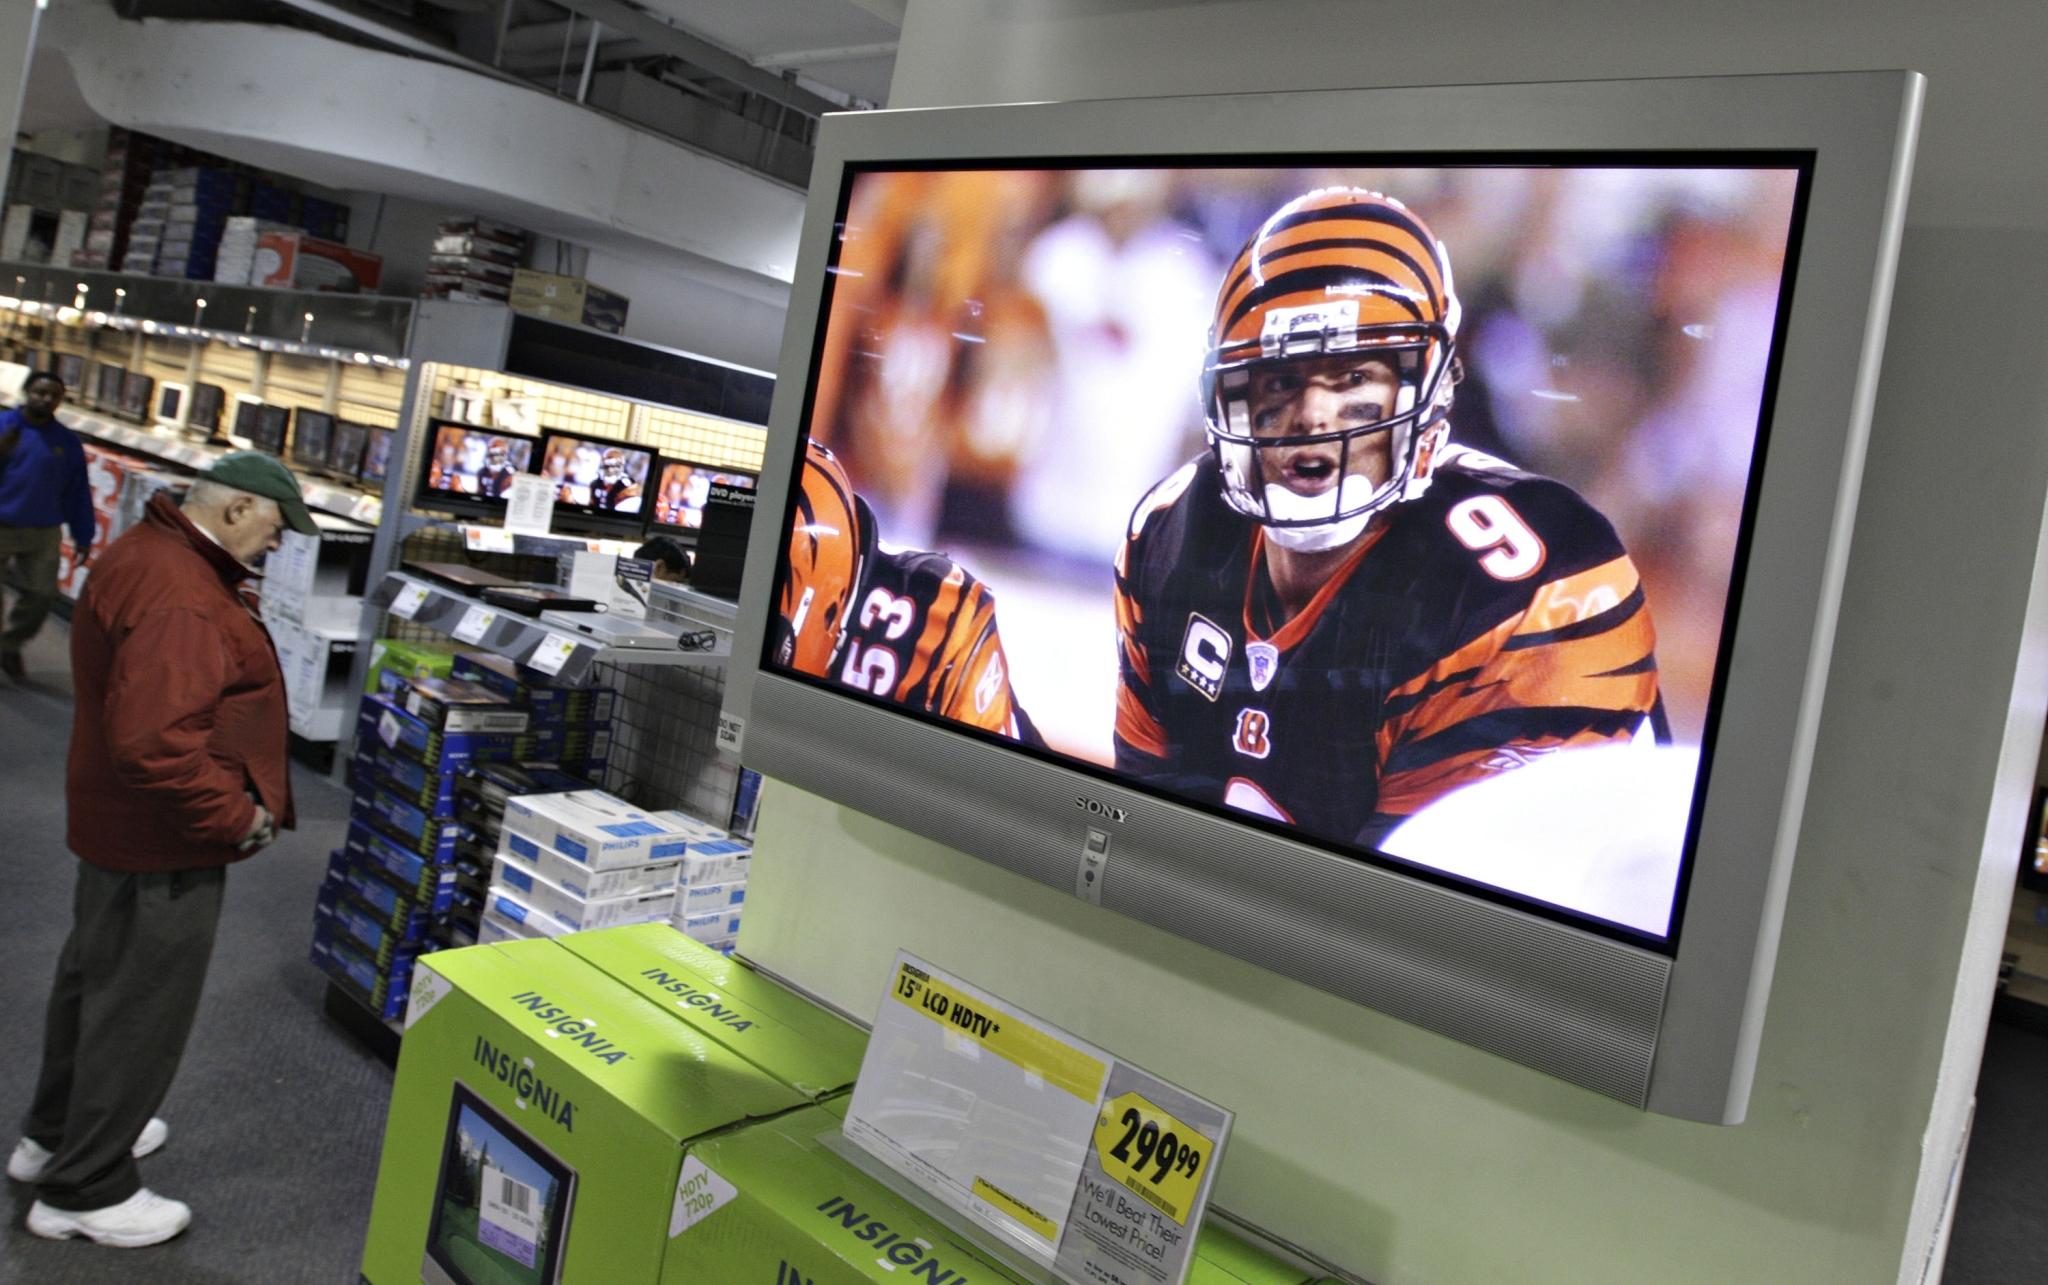 Super Bowl 2019: Low-Scoring Super Bowl Probably Had Low TV